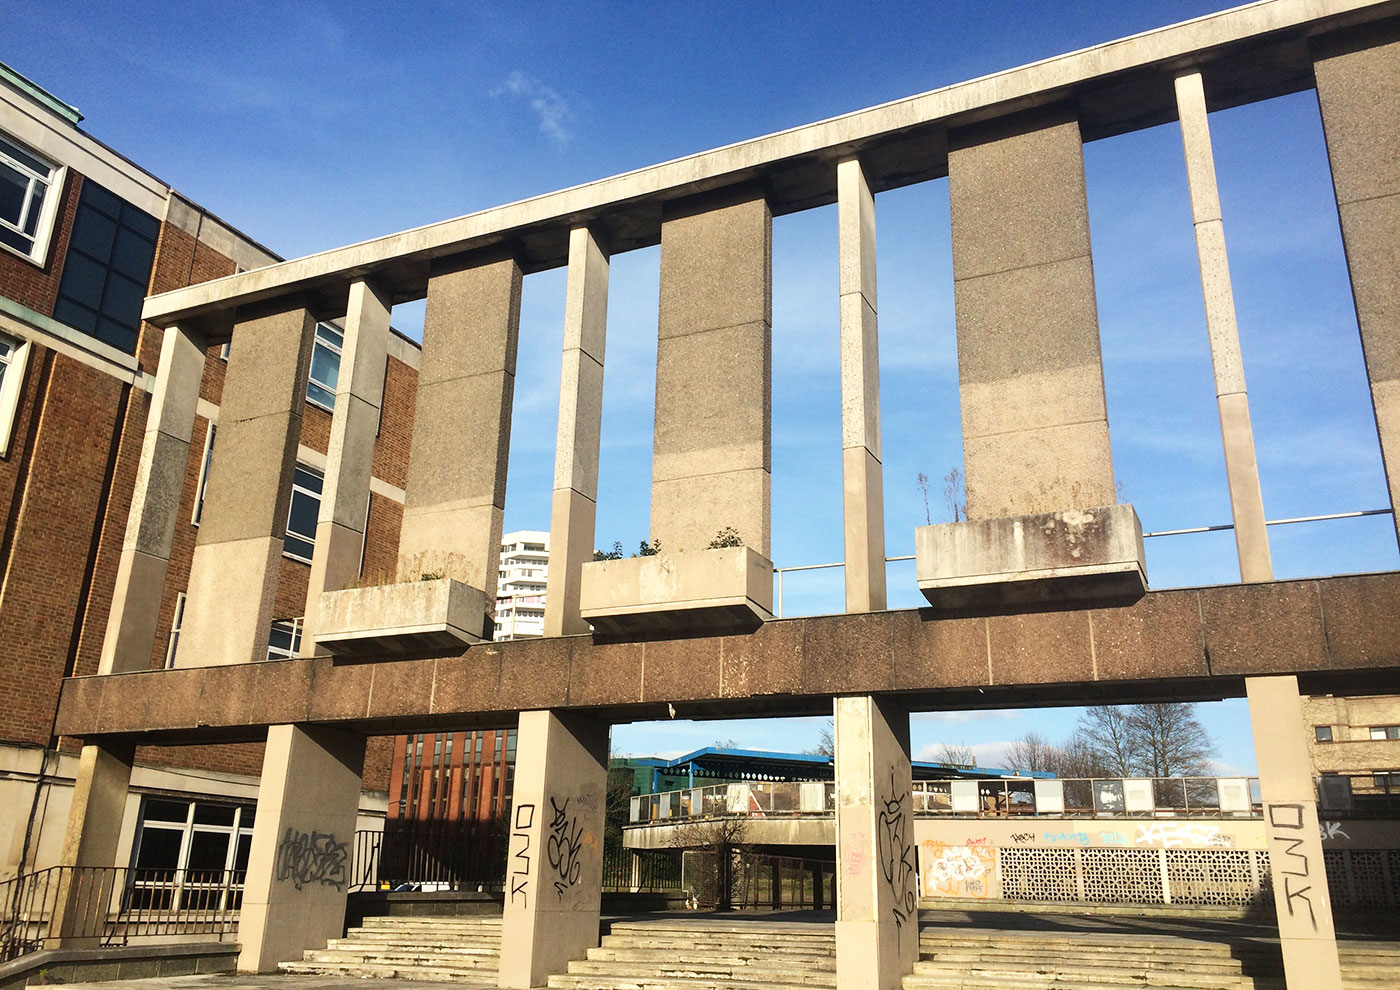 Croydon College and the Fairfield Halls